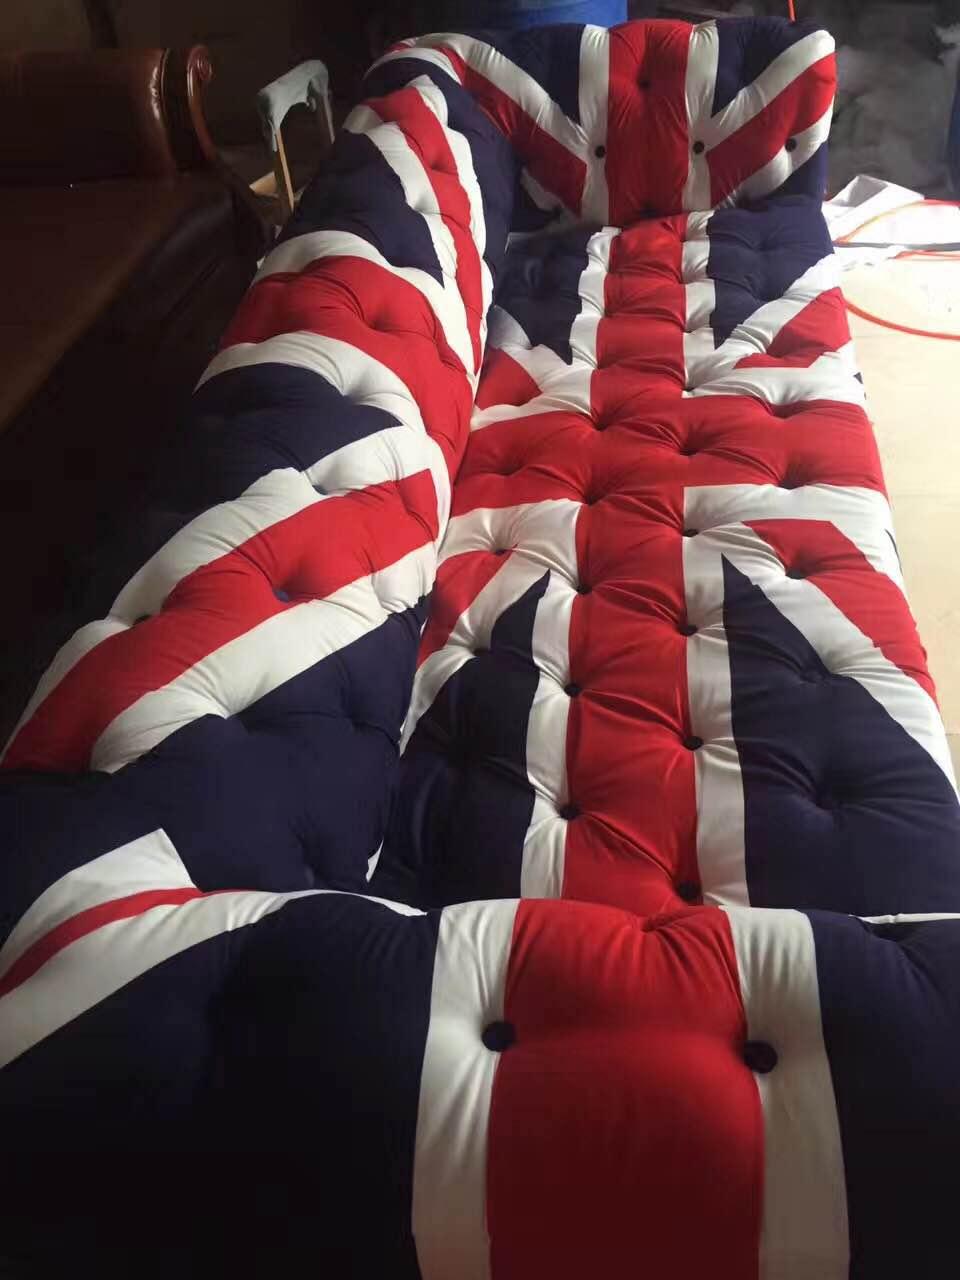 velvet fabric sofa set living room furniture couch/velvet cloth sofas living room sofa sectional/corner sofa 3 seater stock